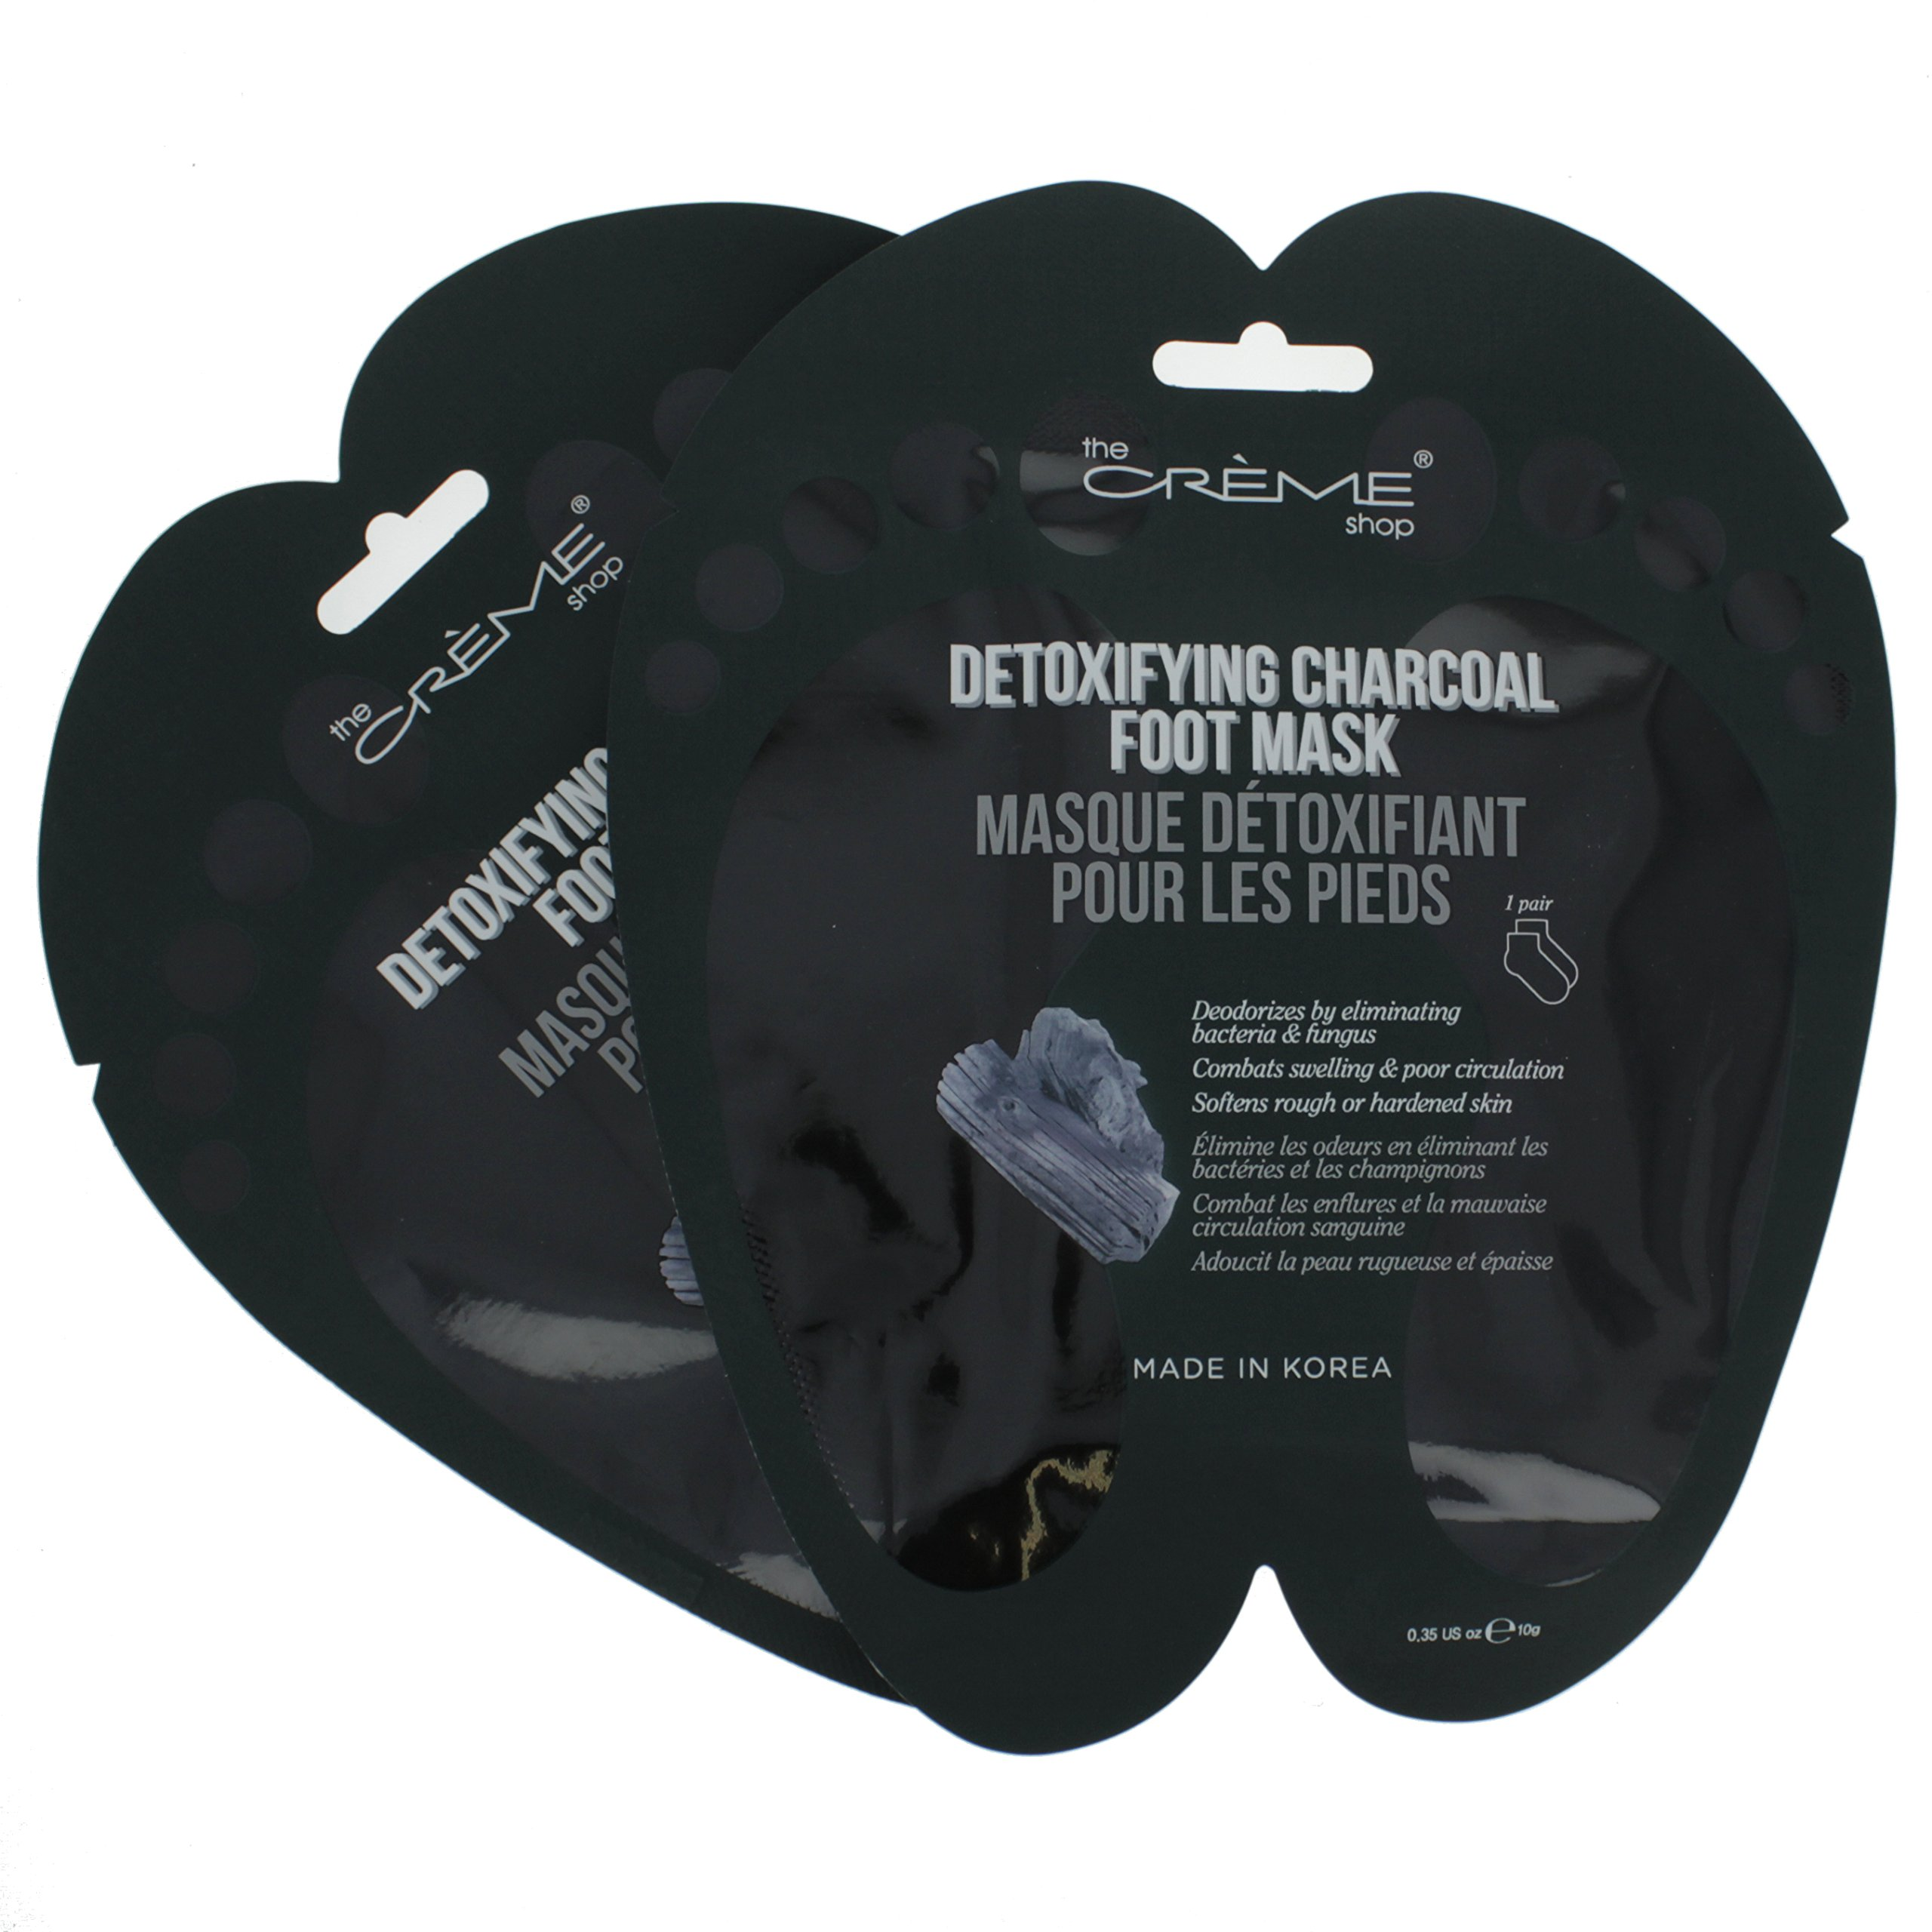 The Crème Shop - Detoxifying Charcoal Foot Mask - 2 pair set